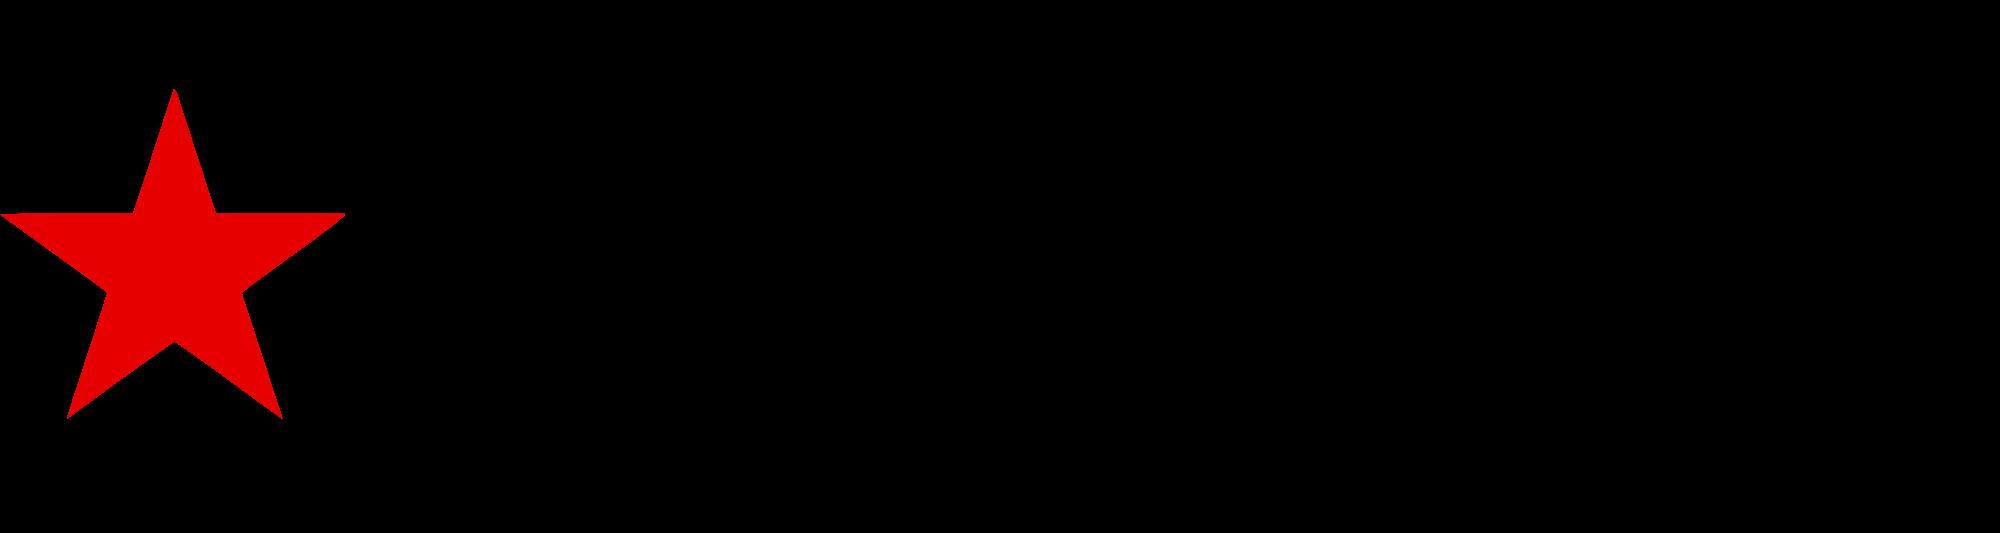 Macy's transparent logo.png